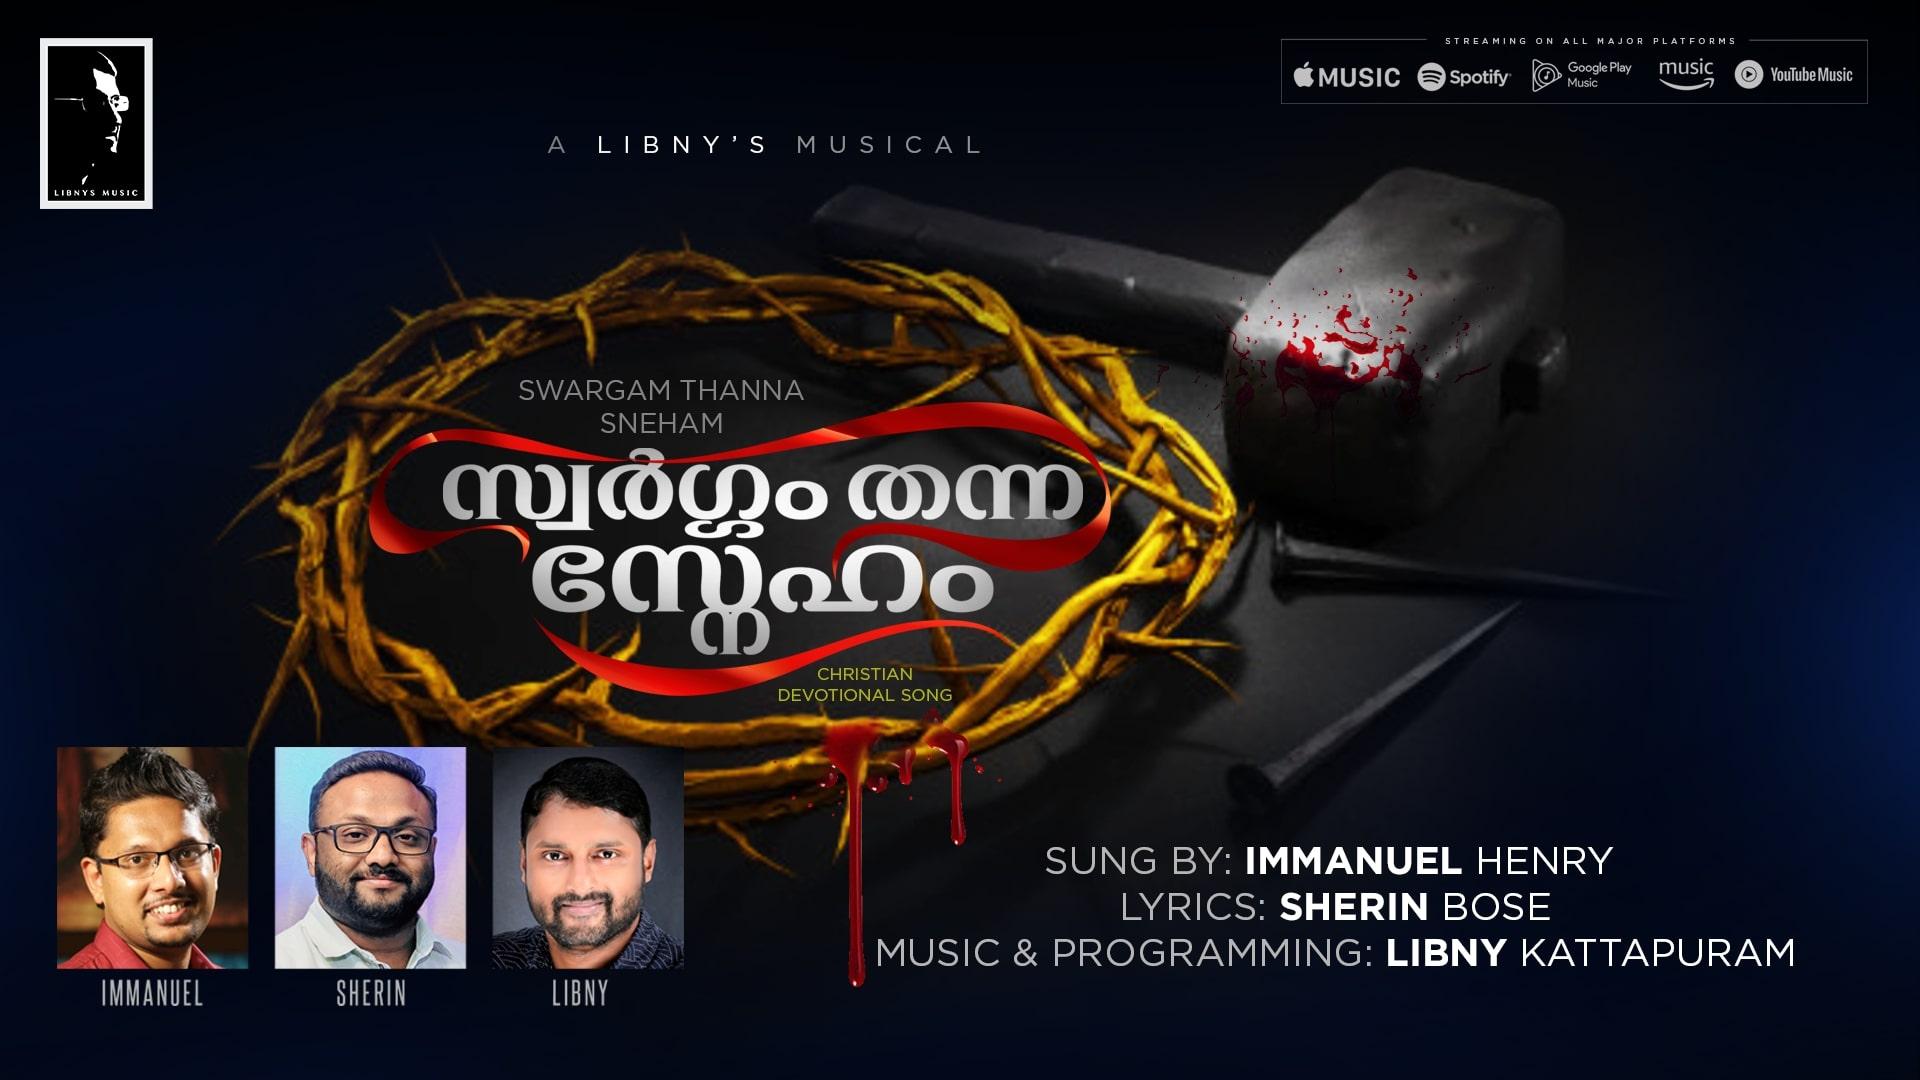 Pathinayirangalil-LibnyKattapuram-SherinBose-LatestChristianSongs